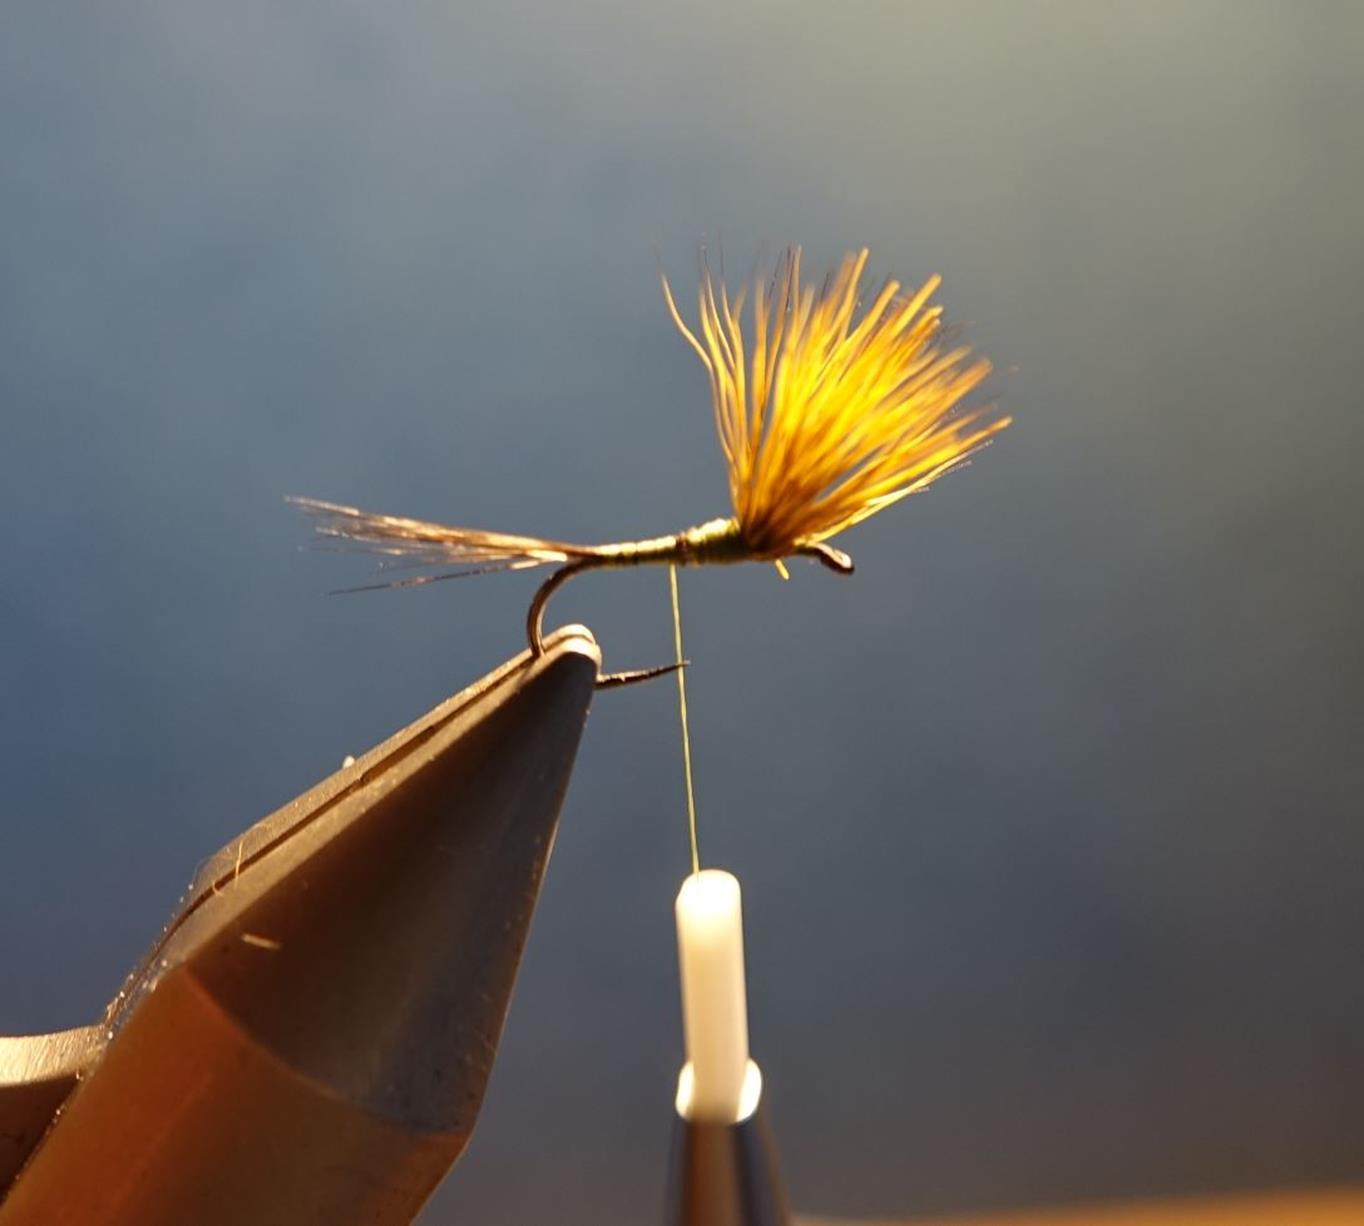 Comparadum poil cervidé olive fly tying mouche eclosion